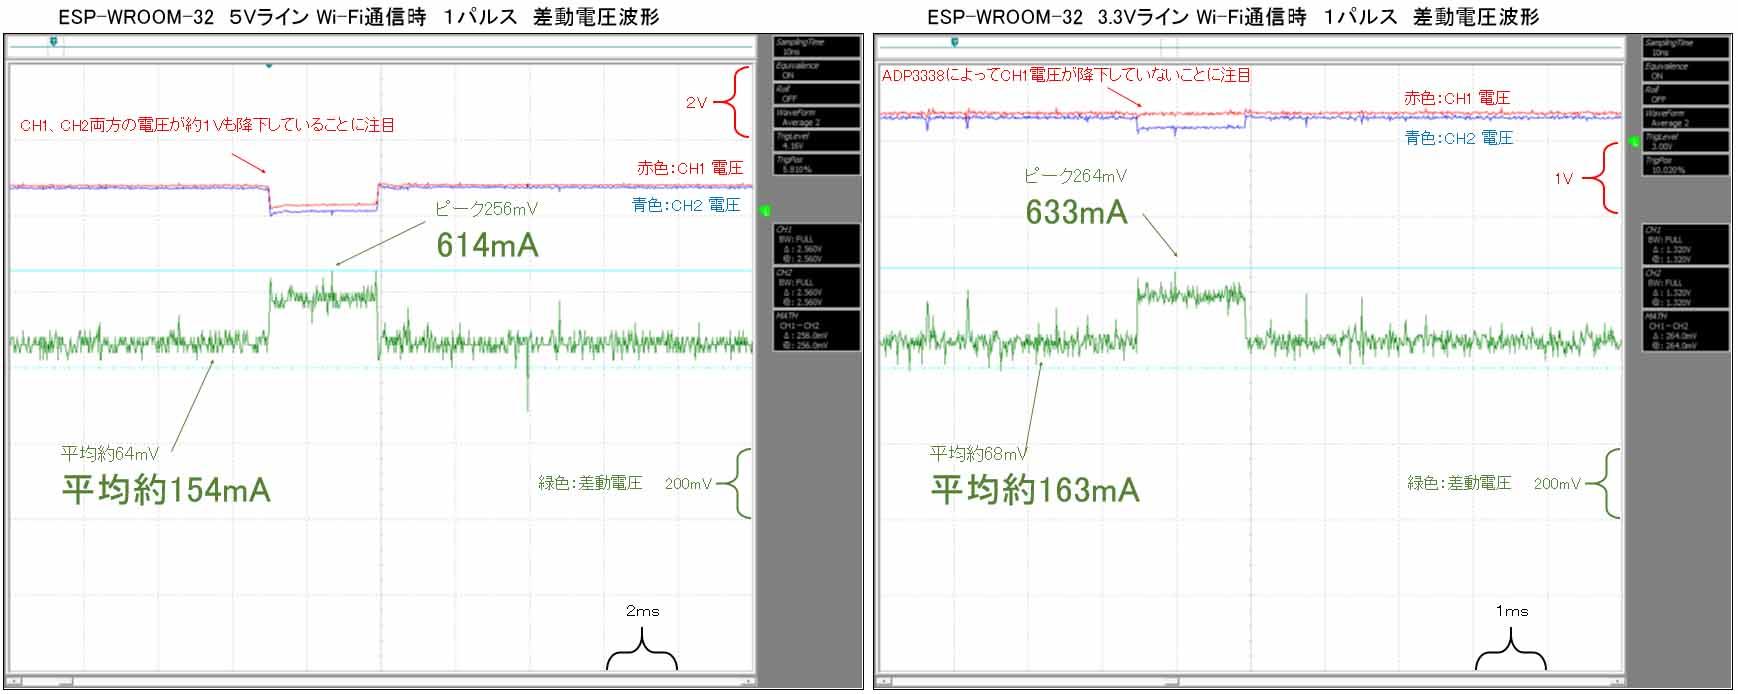 current_26.jpg